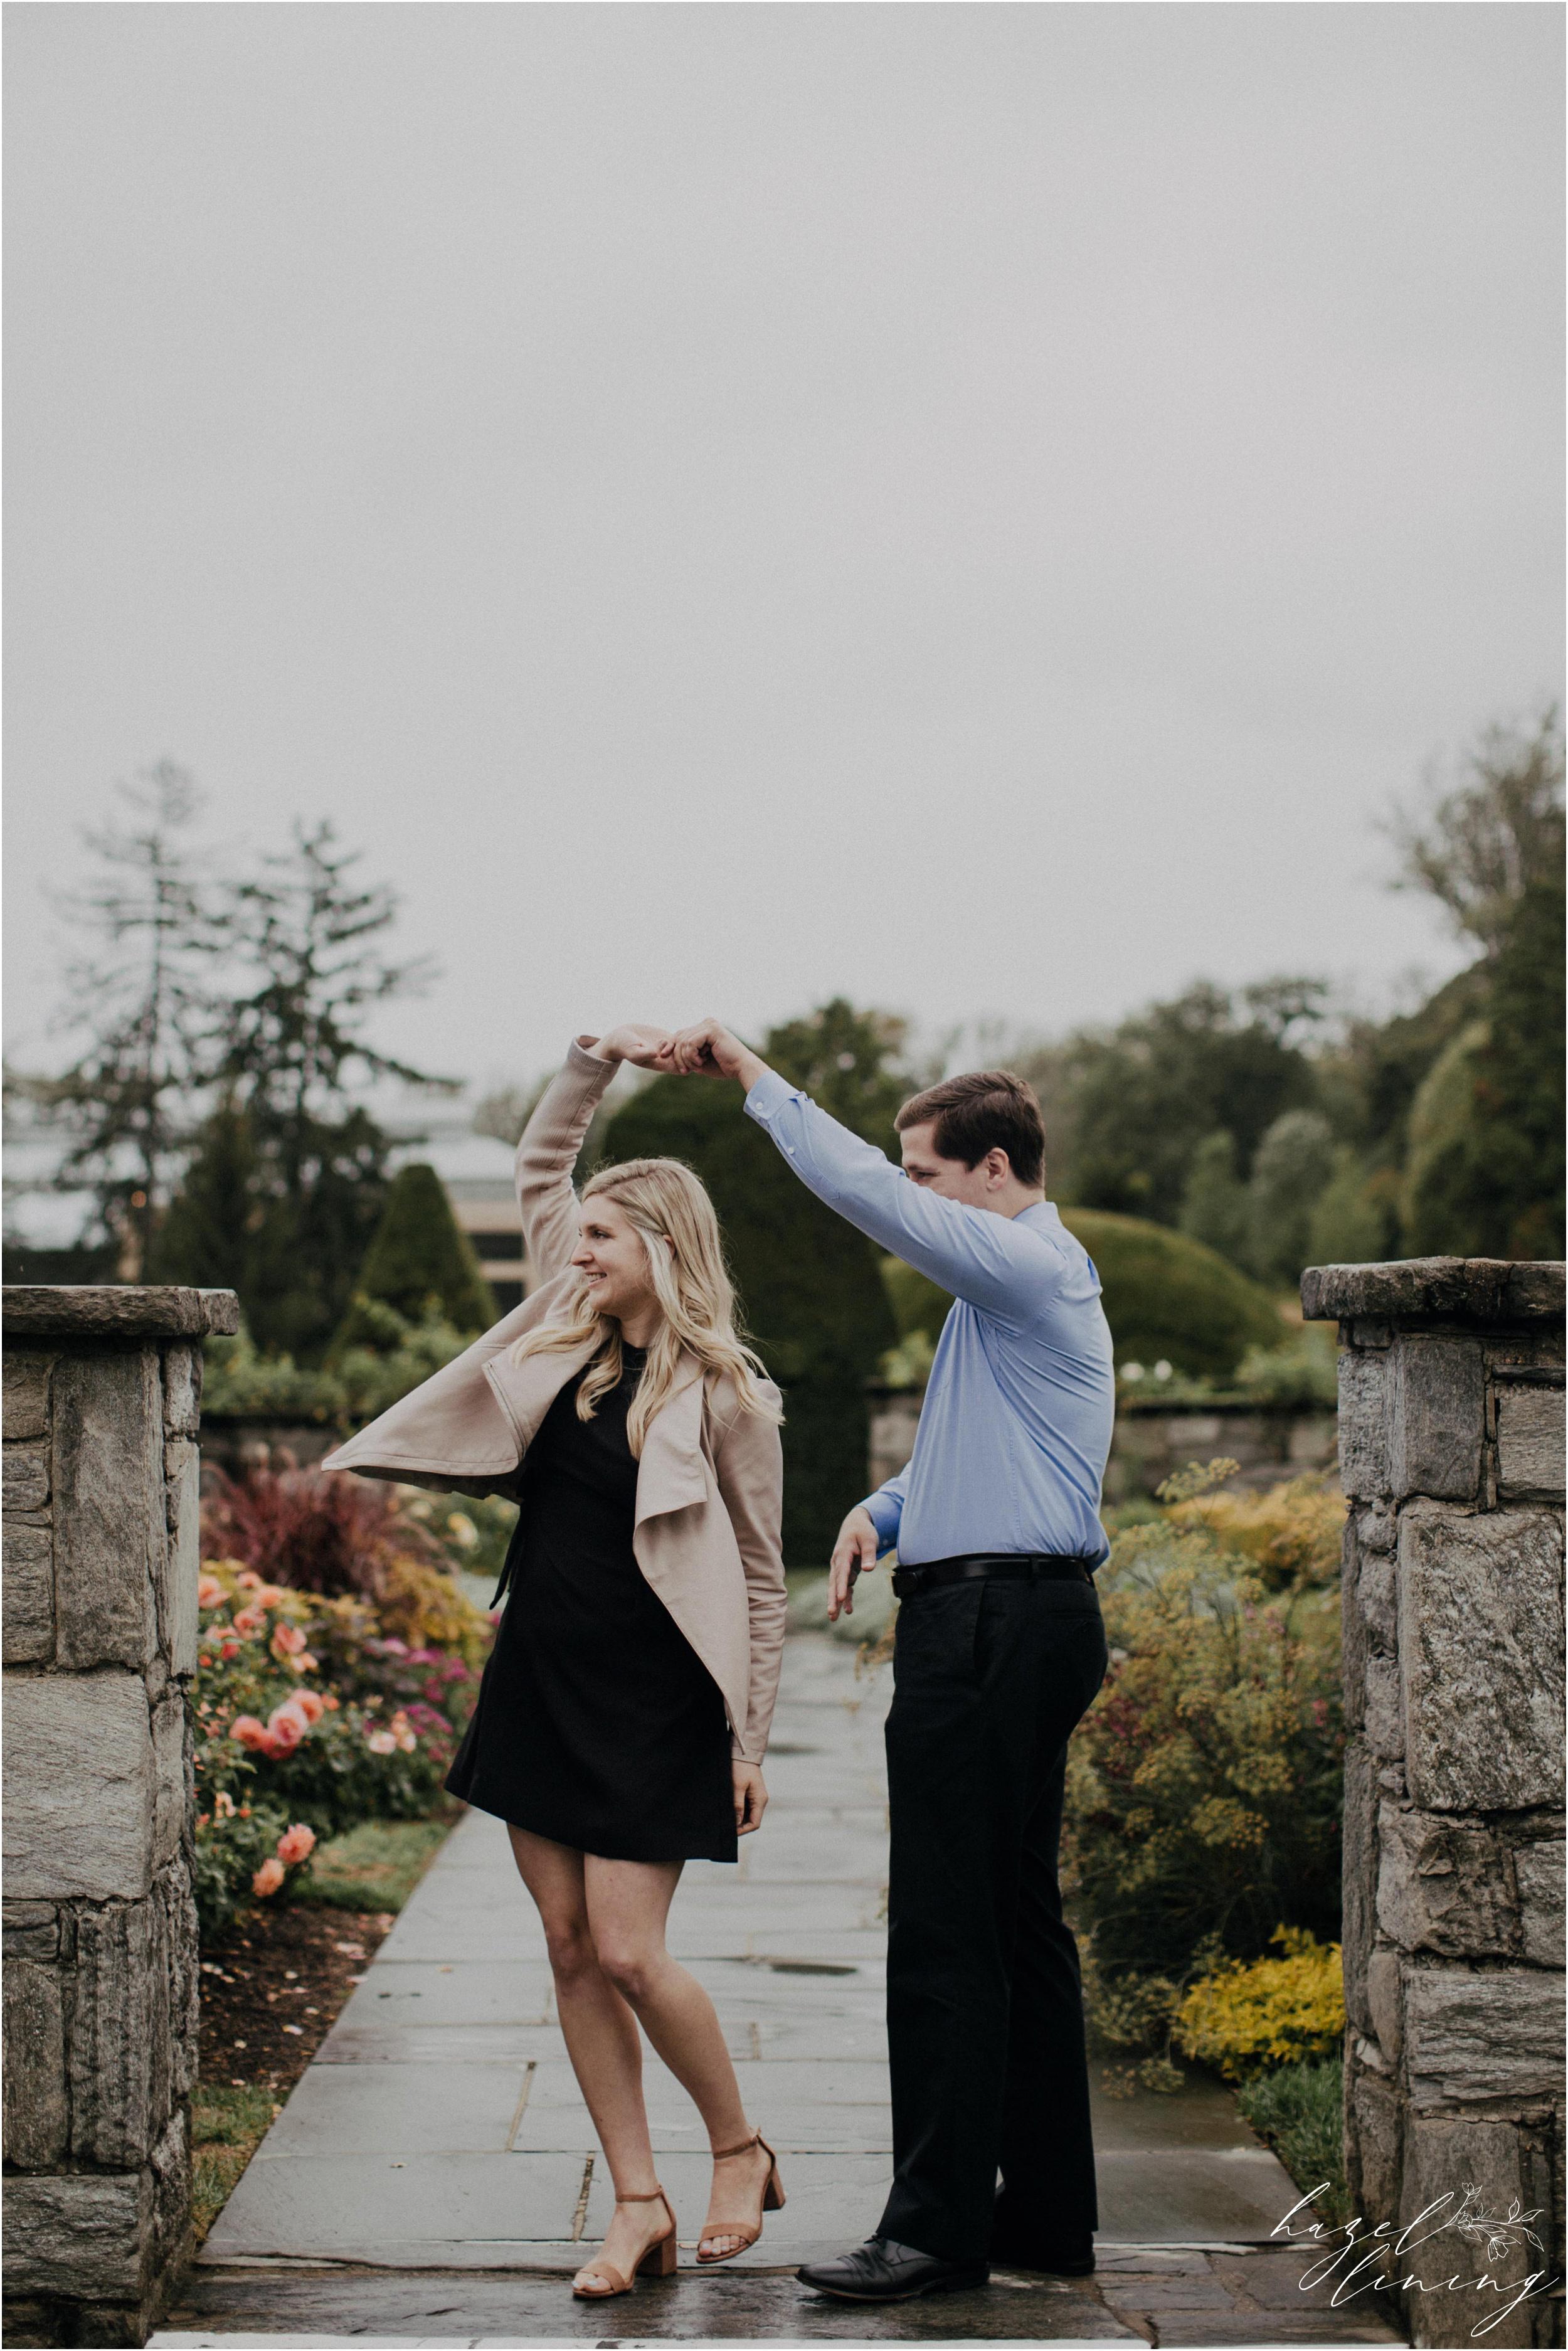 victoria-travis-logan-mayes-longwood-gardens-kennett-square-philadelphia-engagement-session-hazel-lining-photography-destination-elopement-wedding-engagement-photography_0004.jpg